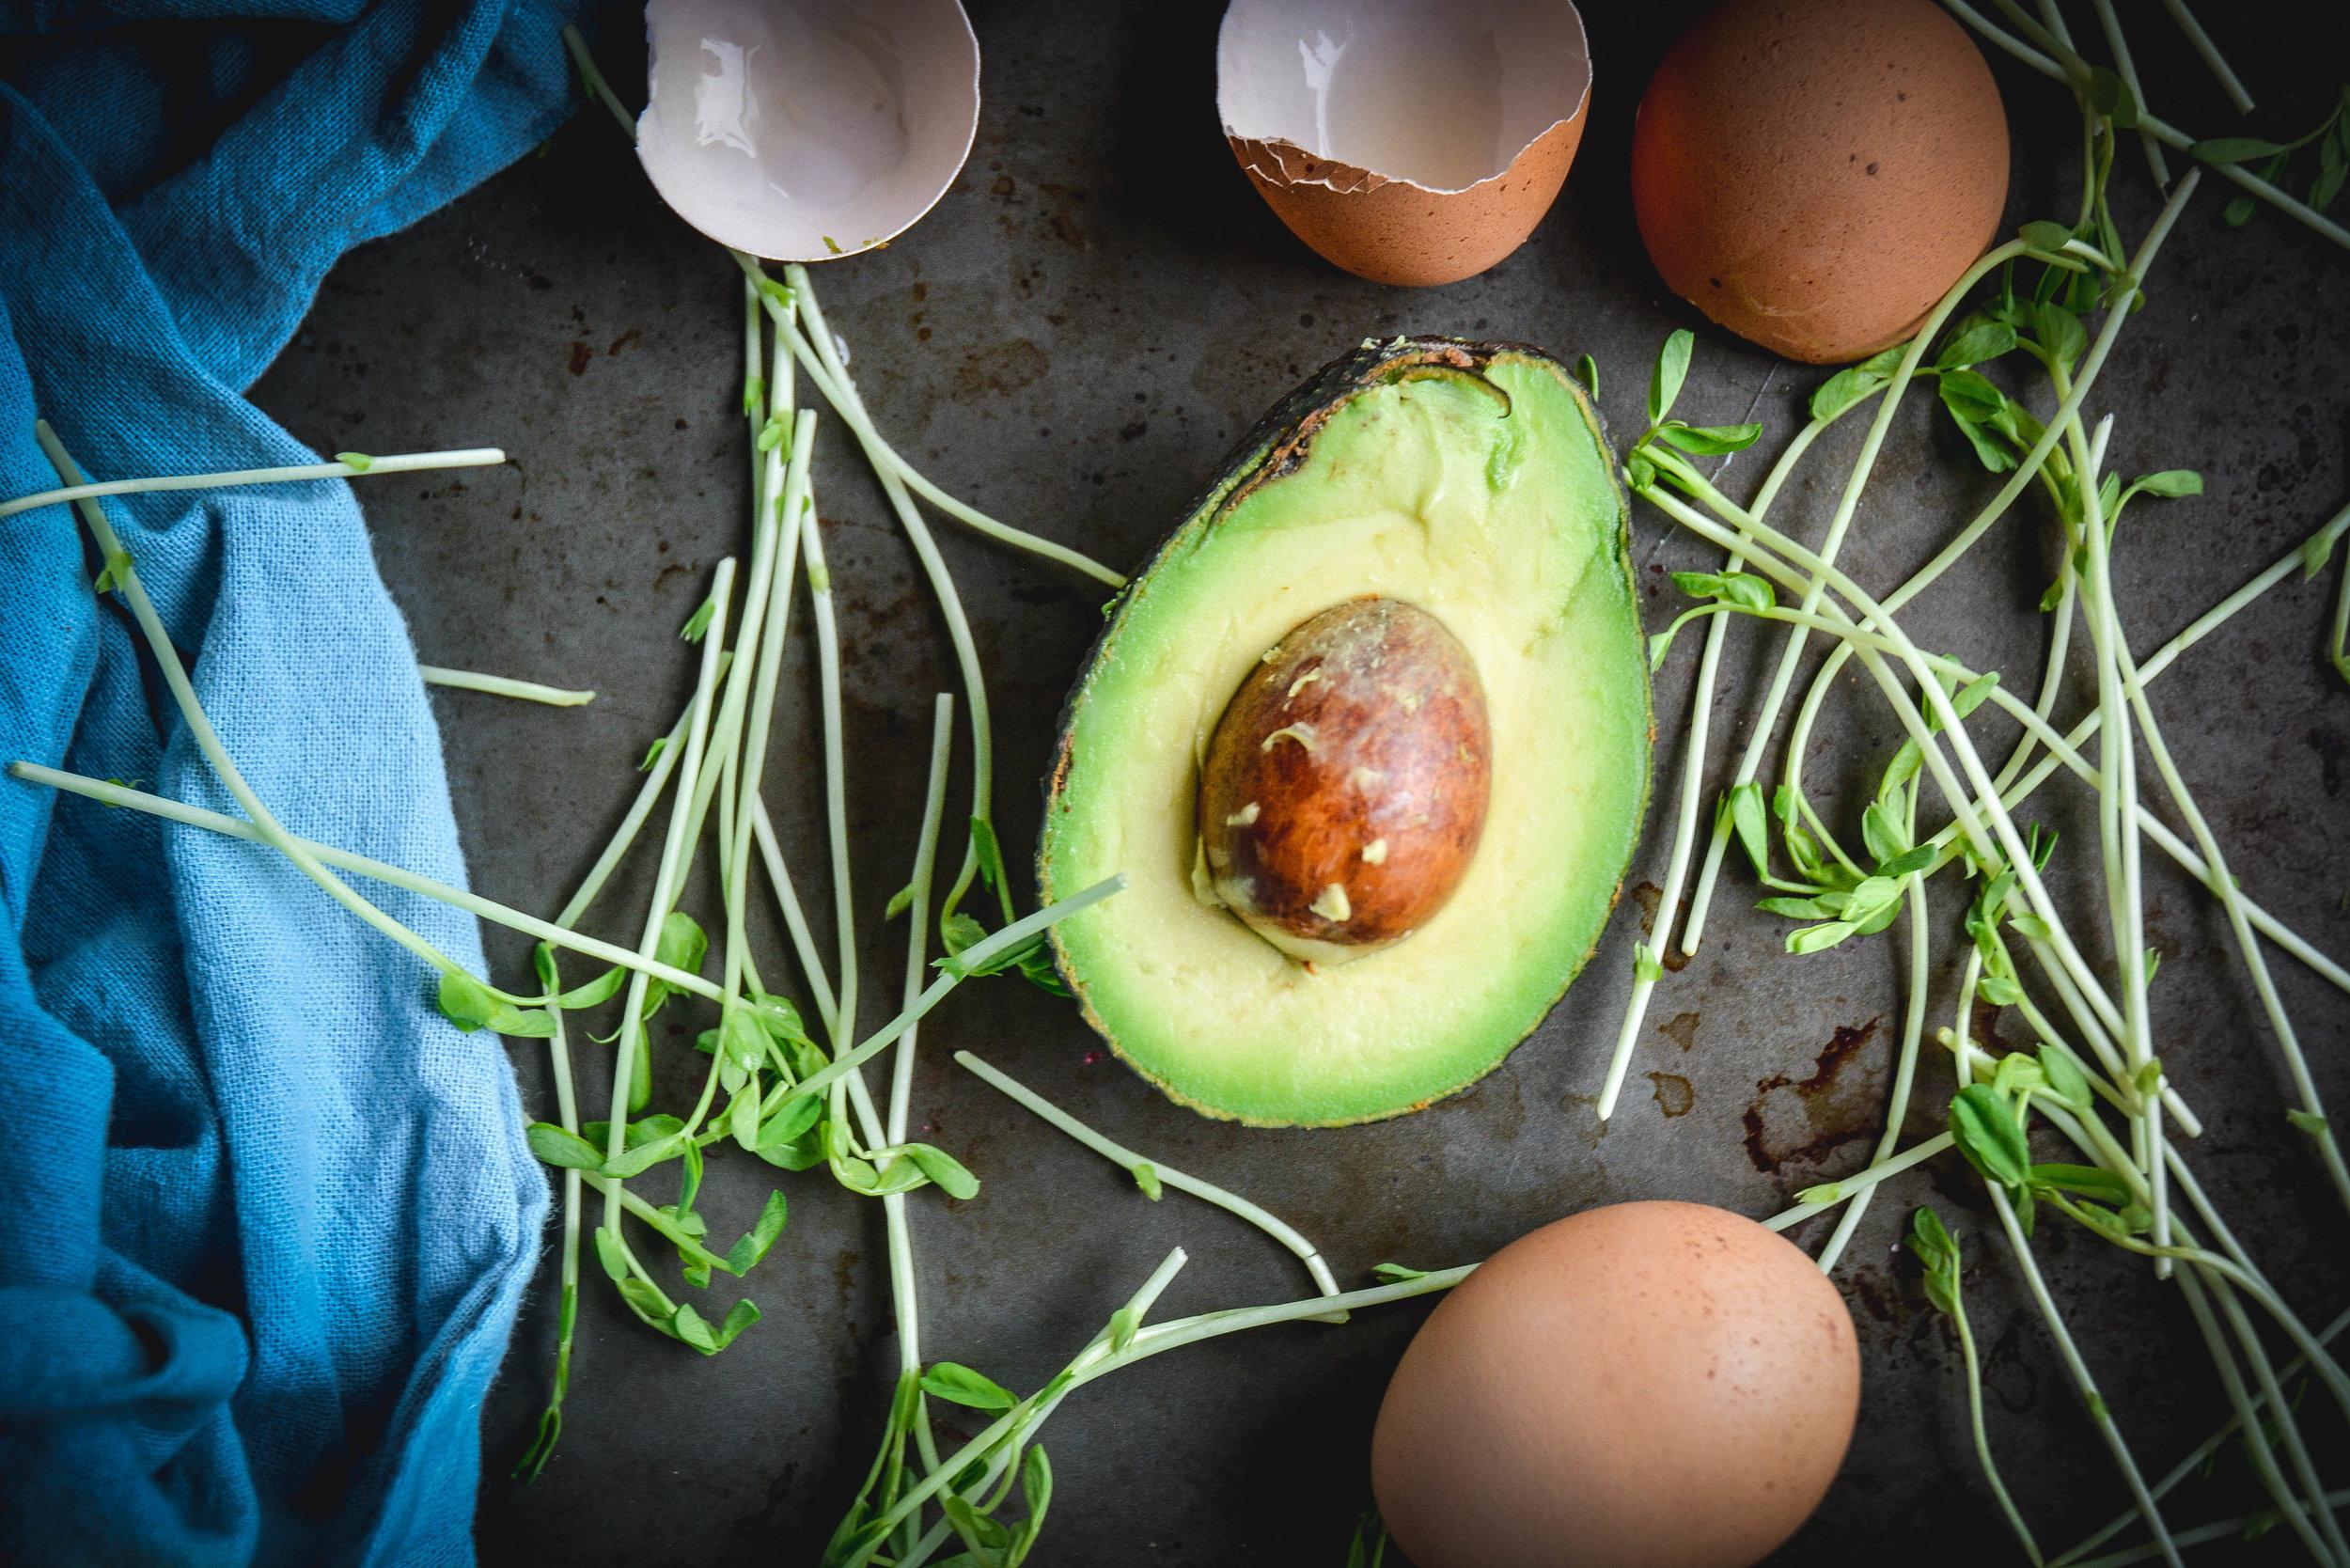 avocado, greens and egg shells